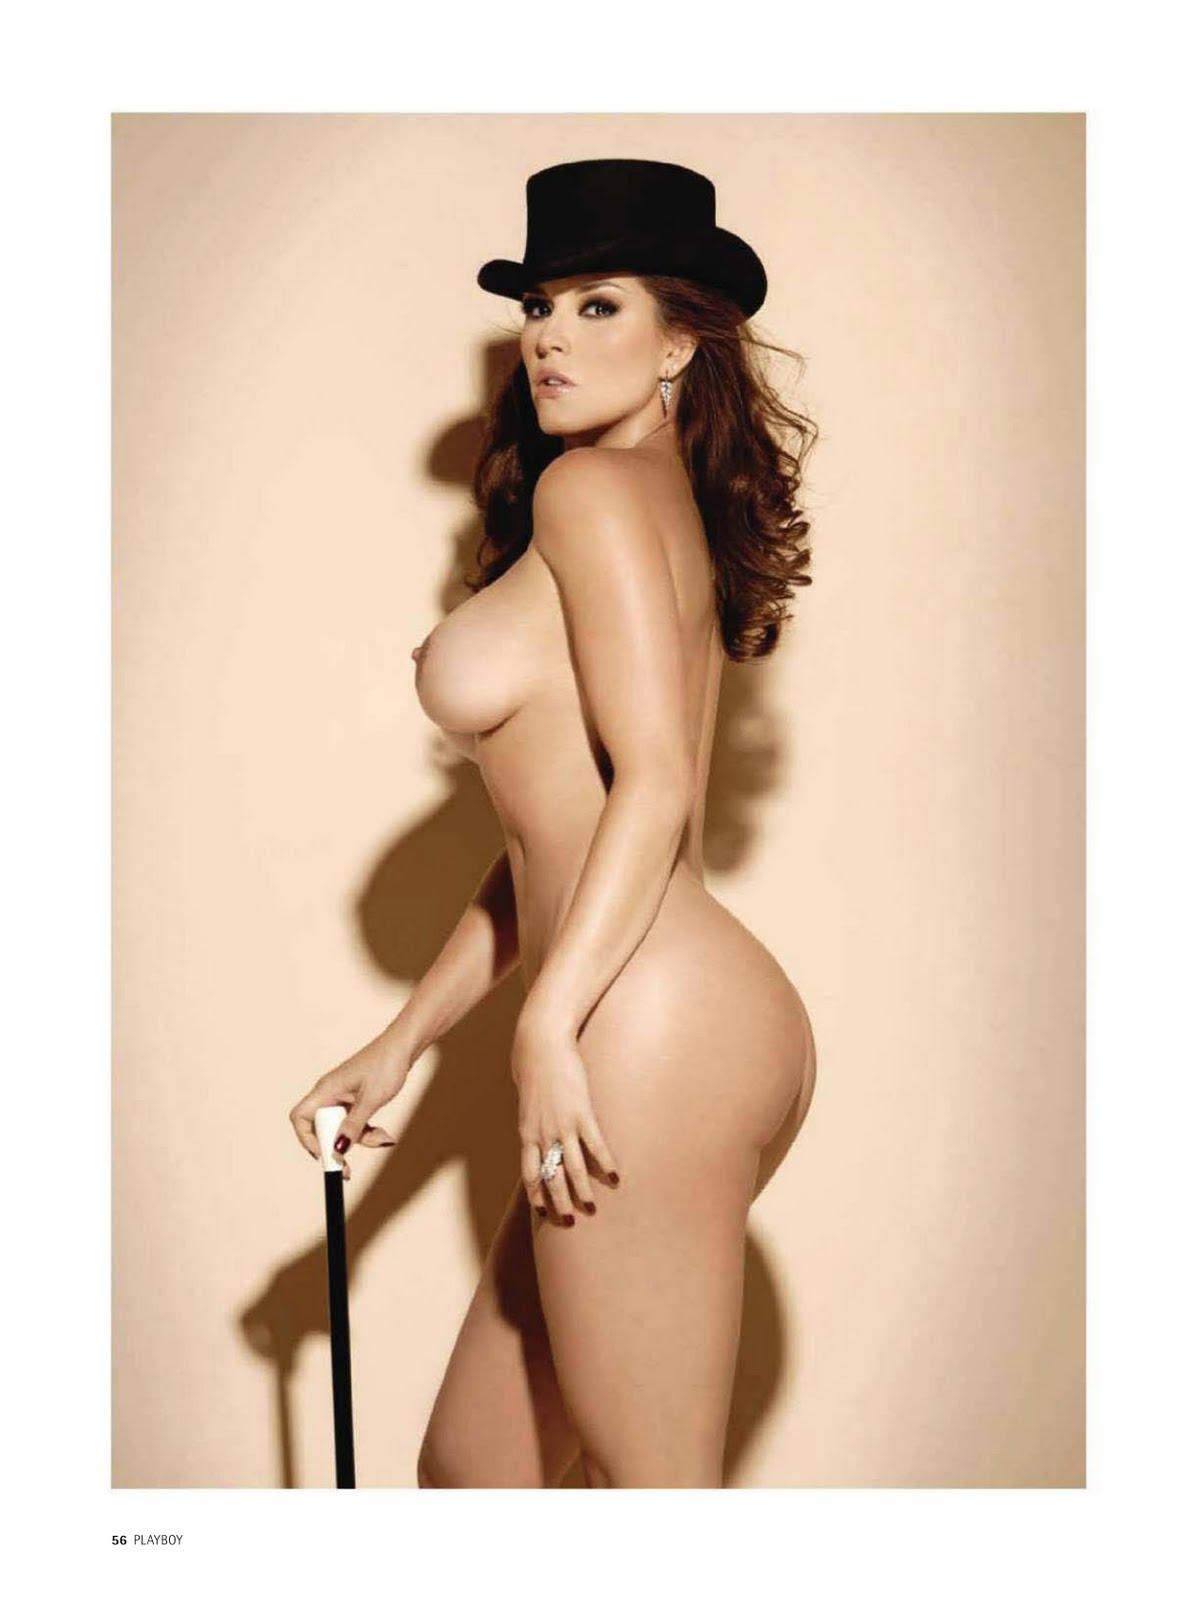 Alicia Machado Totalmente Desnuda